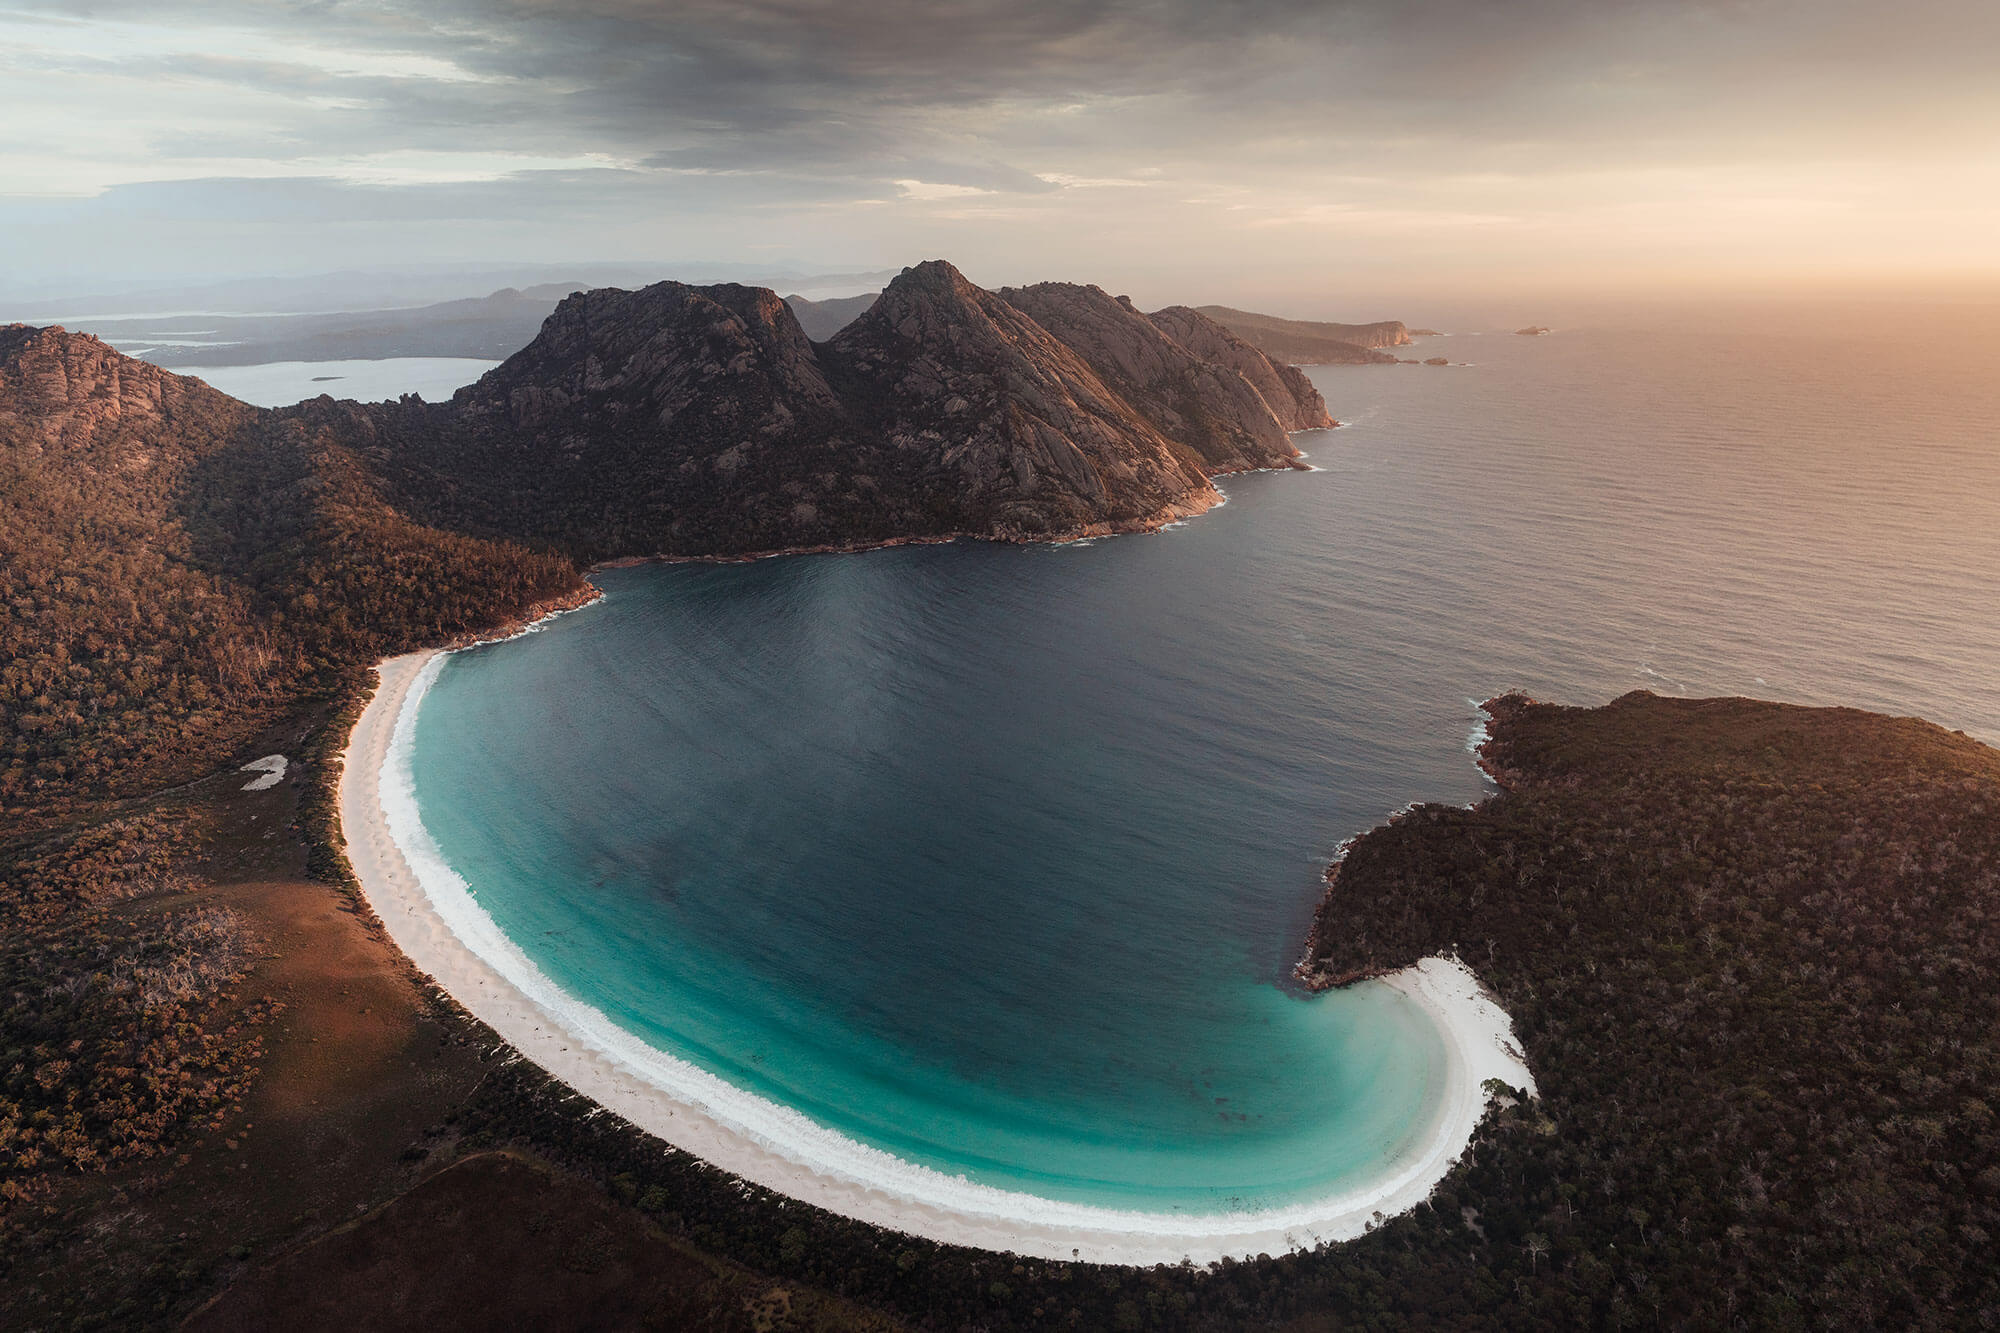 Aerial photo of beach by Jason Charles Hill